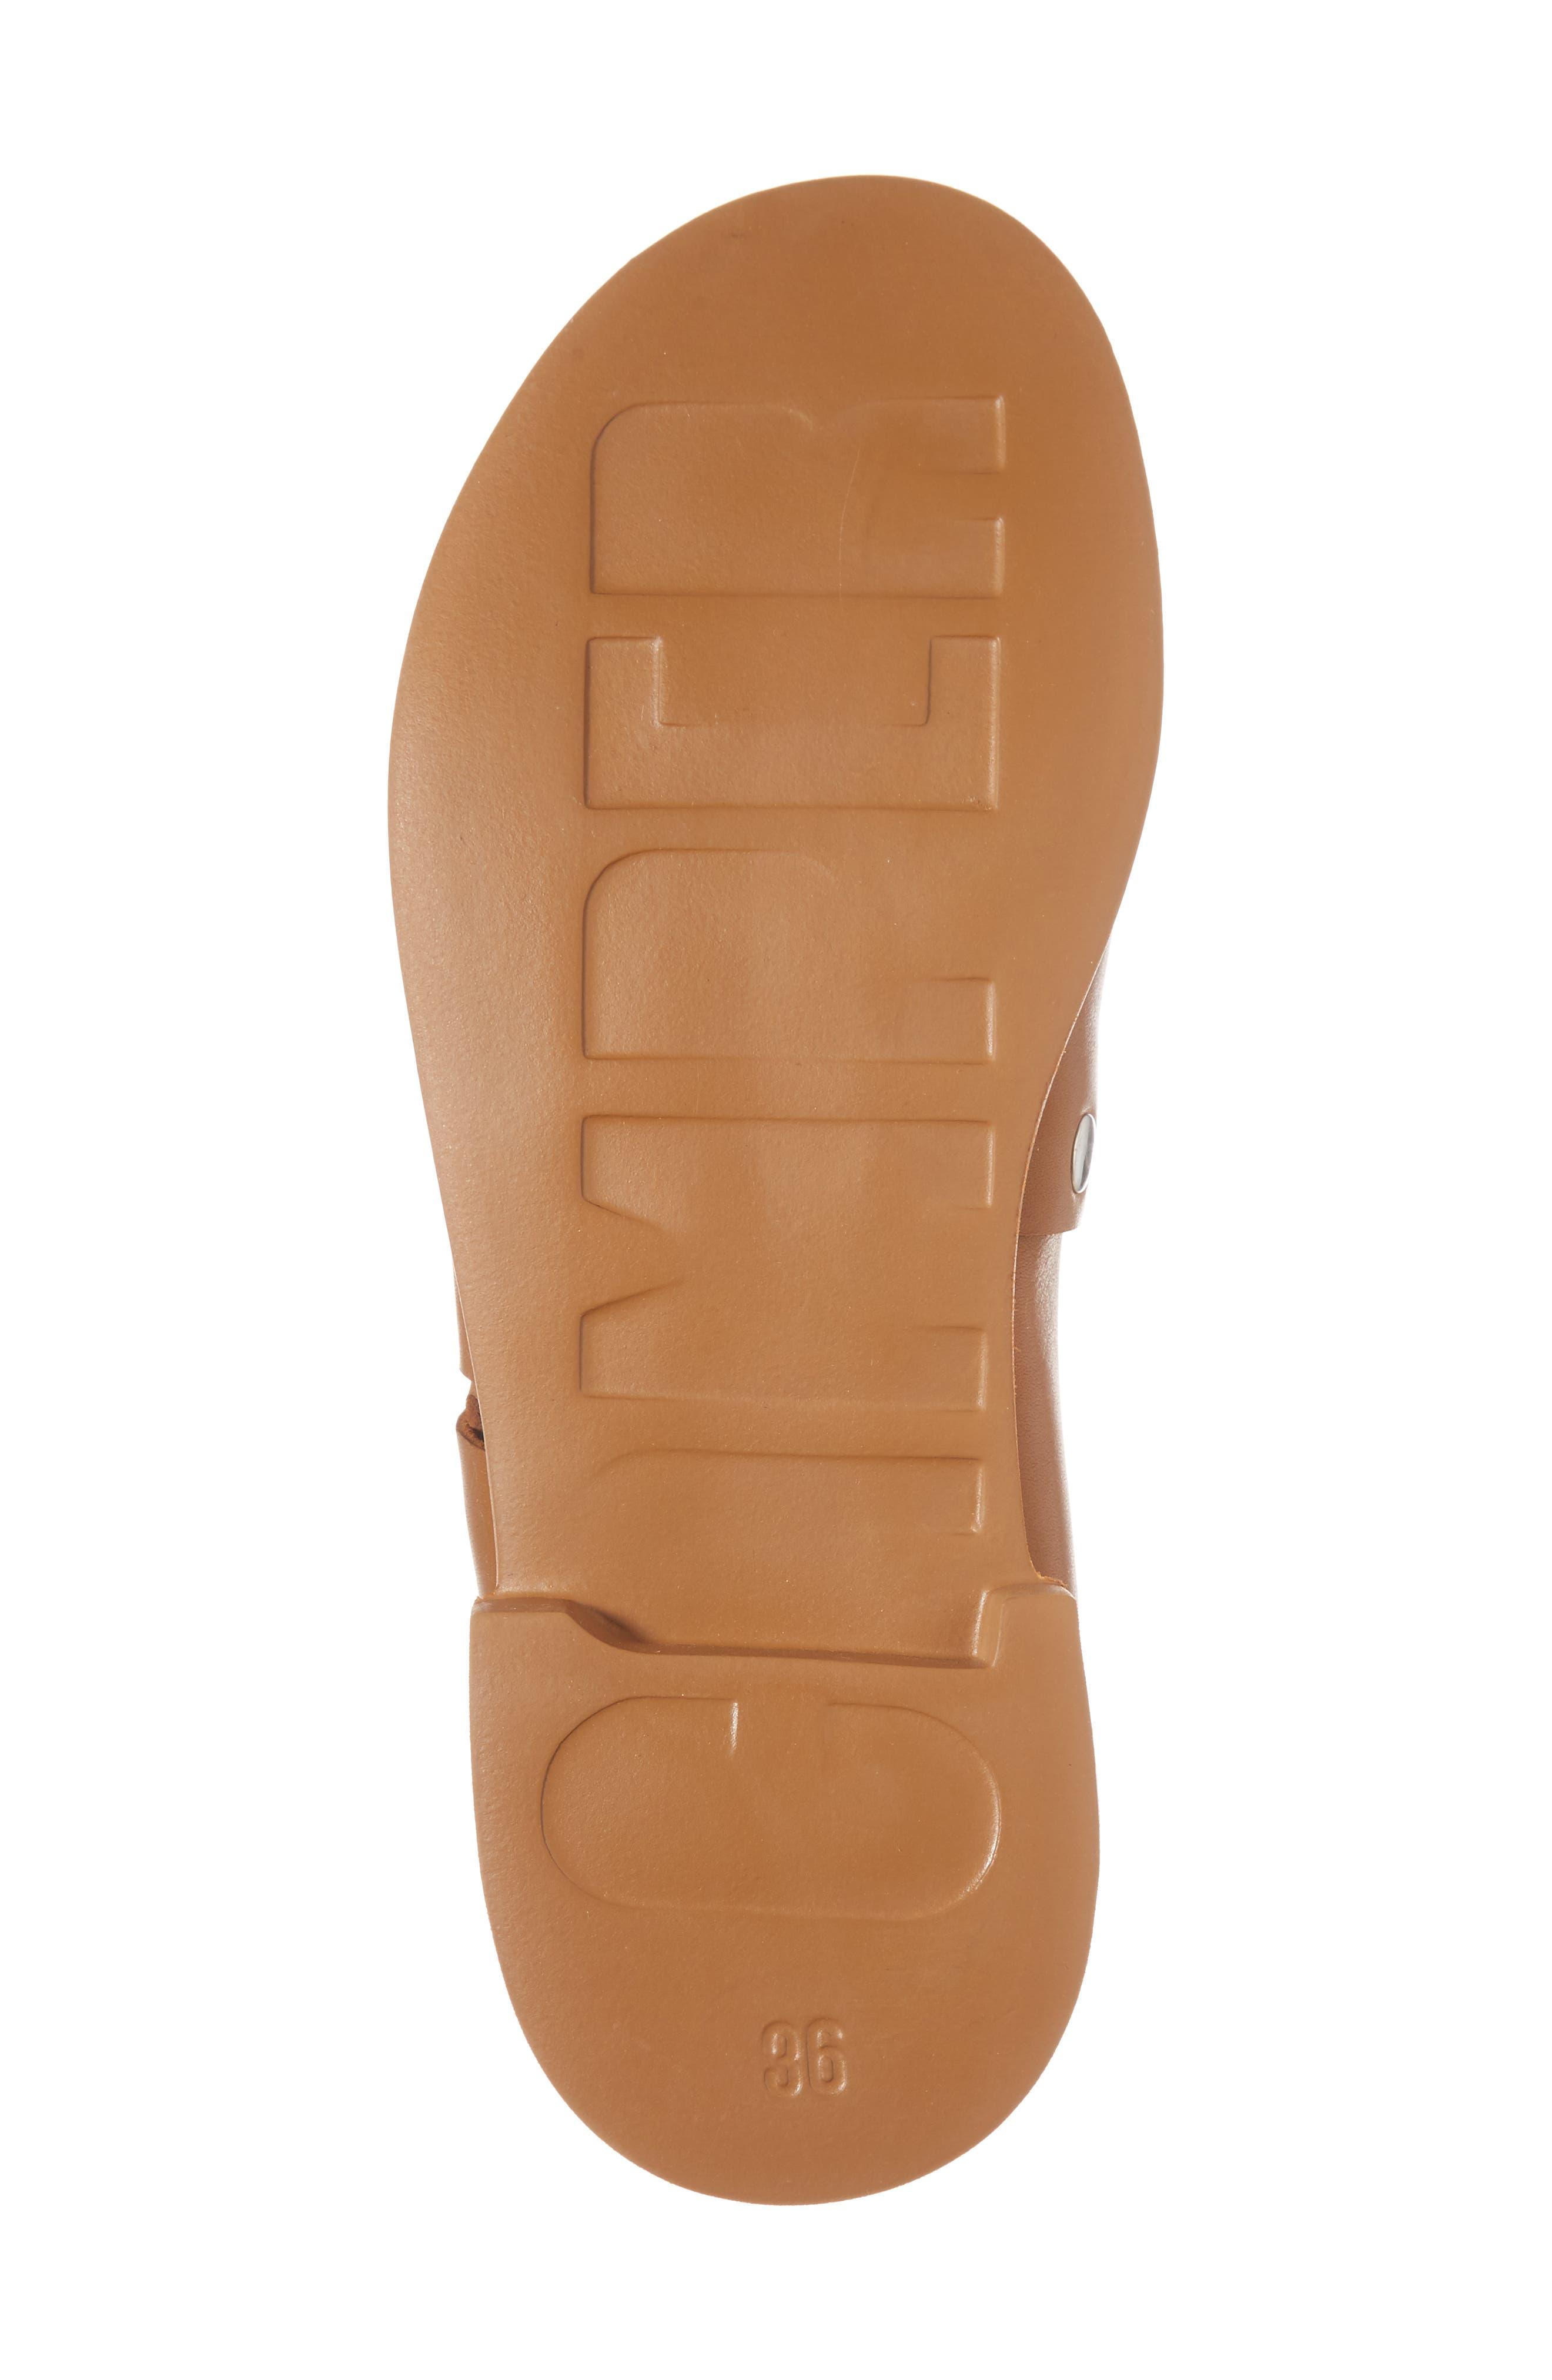 Edy Slingback Sandal,                             Alternate thumbnail 6, color,                             Rust/ Copper Leather